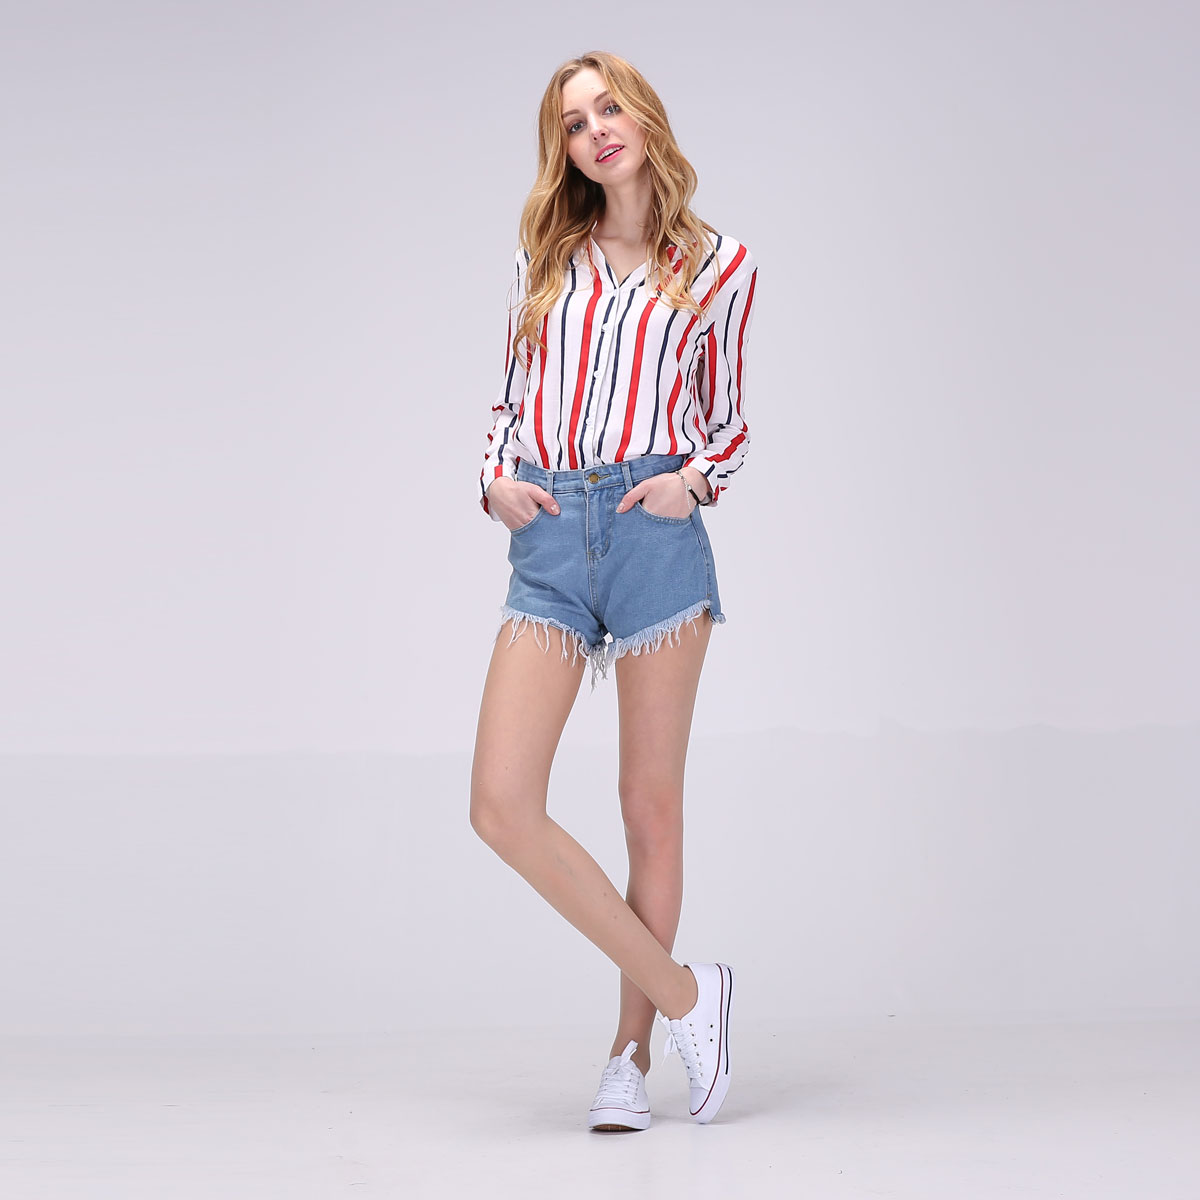 2017 Hot New Women Full Sleeve Blouses Striped Shirts Women Summer Tops Flare Sleeve Blouse Chemise Femme P Size 11